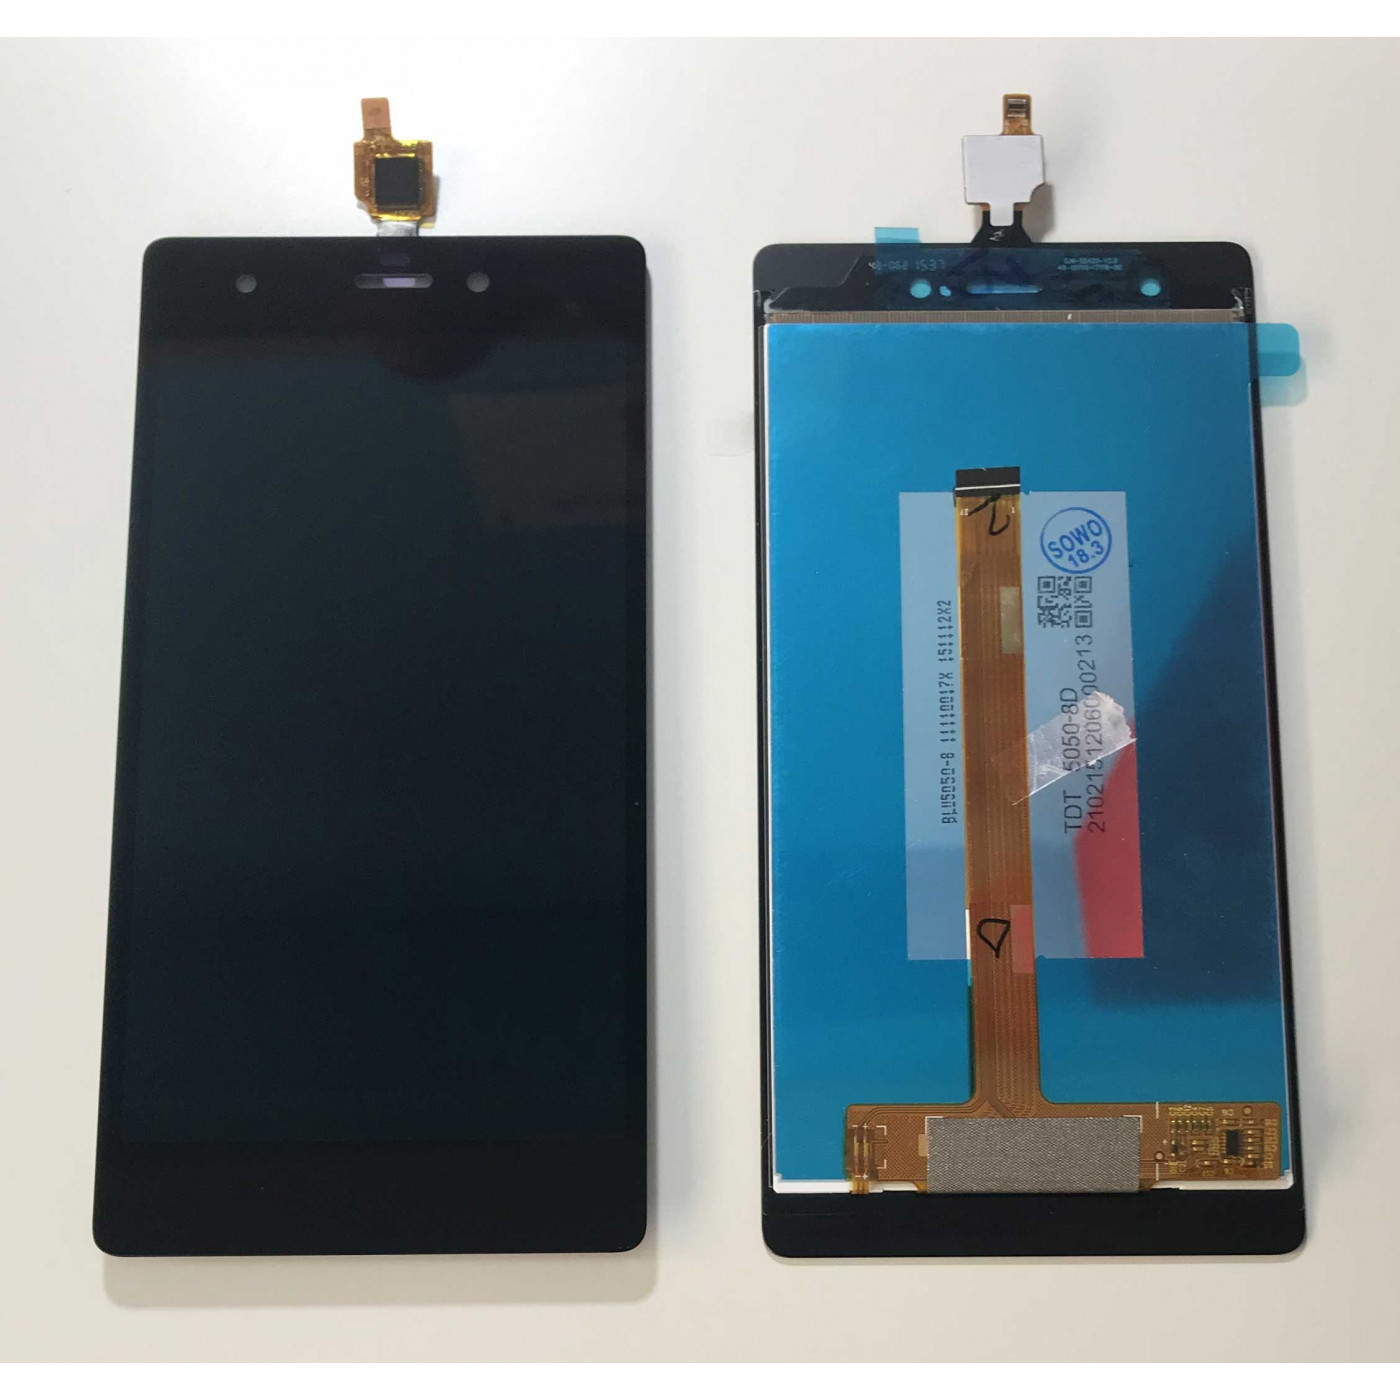 PANTALLA TÁCTIL DE CRISTAL + PANTALLA LCD ENSAMBLADA Wiko Pulp 4G 5.0 Negro